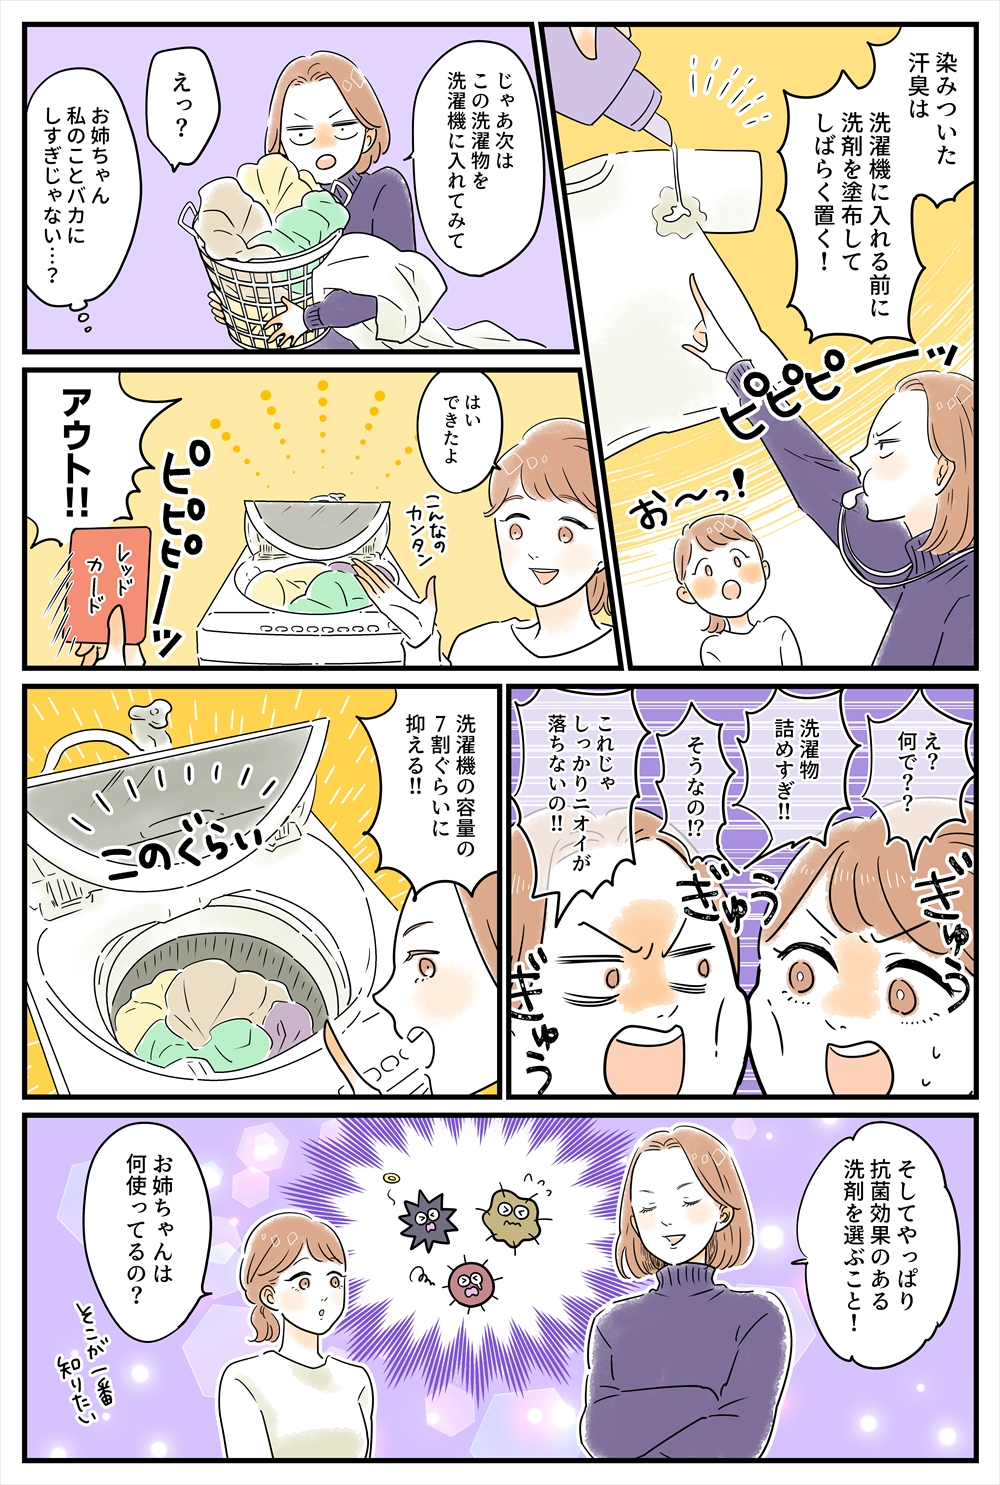 NANOXウェブ漫画-3P_r